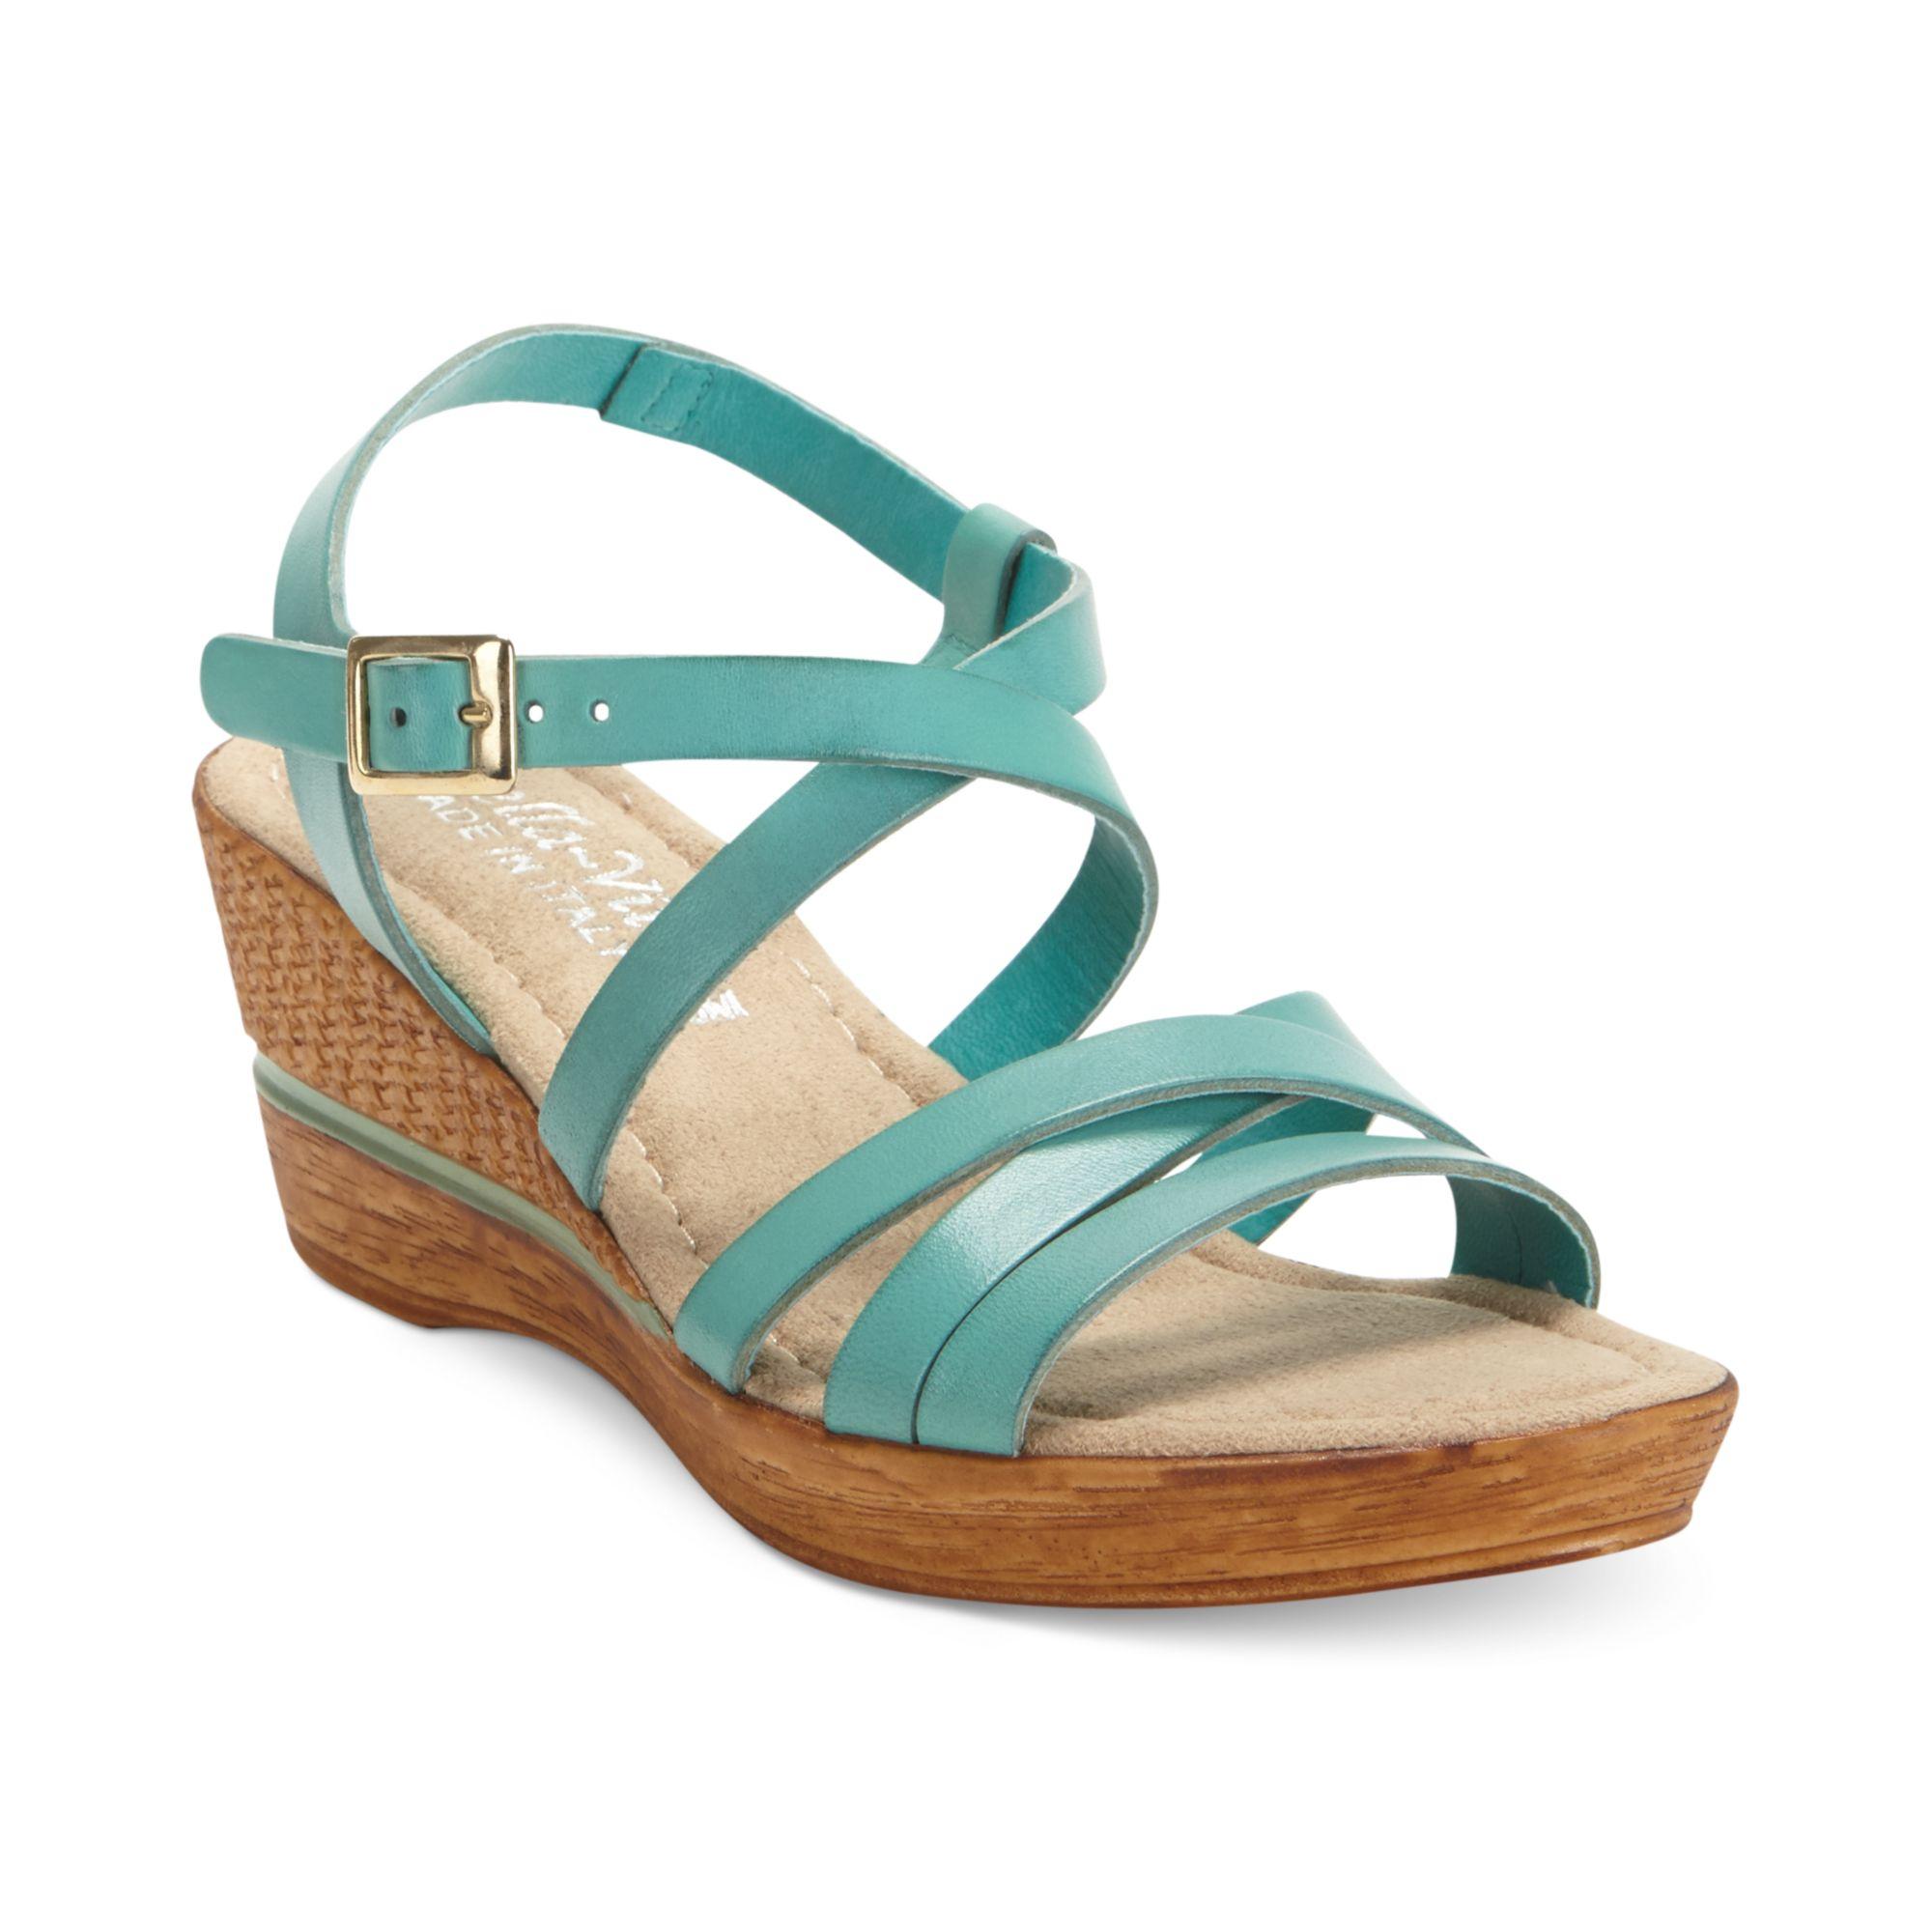 Bella Vita Italian Collection Bacio Platform Wedge Sandals